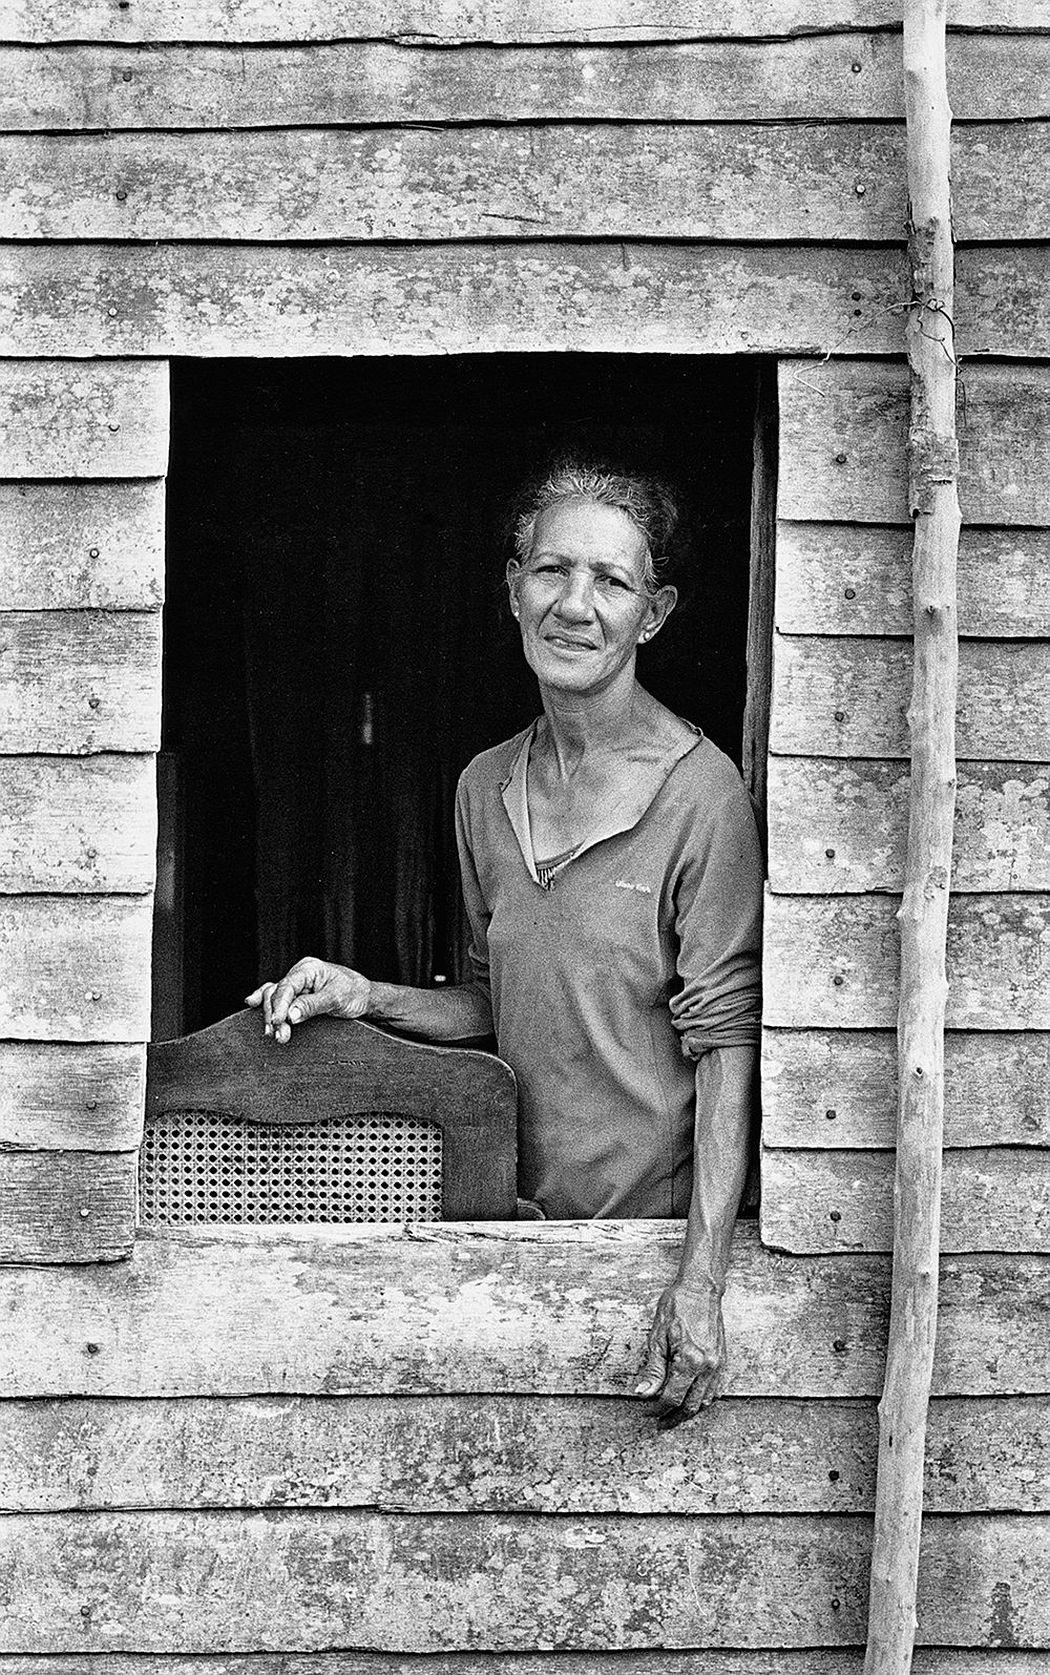 © CUBA by Elliott Erwitt, published by teNeues, www.teneues.com, Finca Ildelisa, Pio Cuá, Matanzas, 2016, Photo © 2017 Elliott Erwitt/Magnum Photos. All rights reserved.